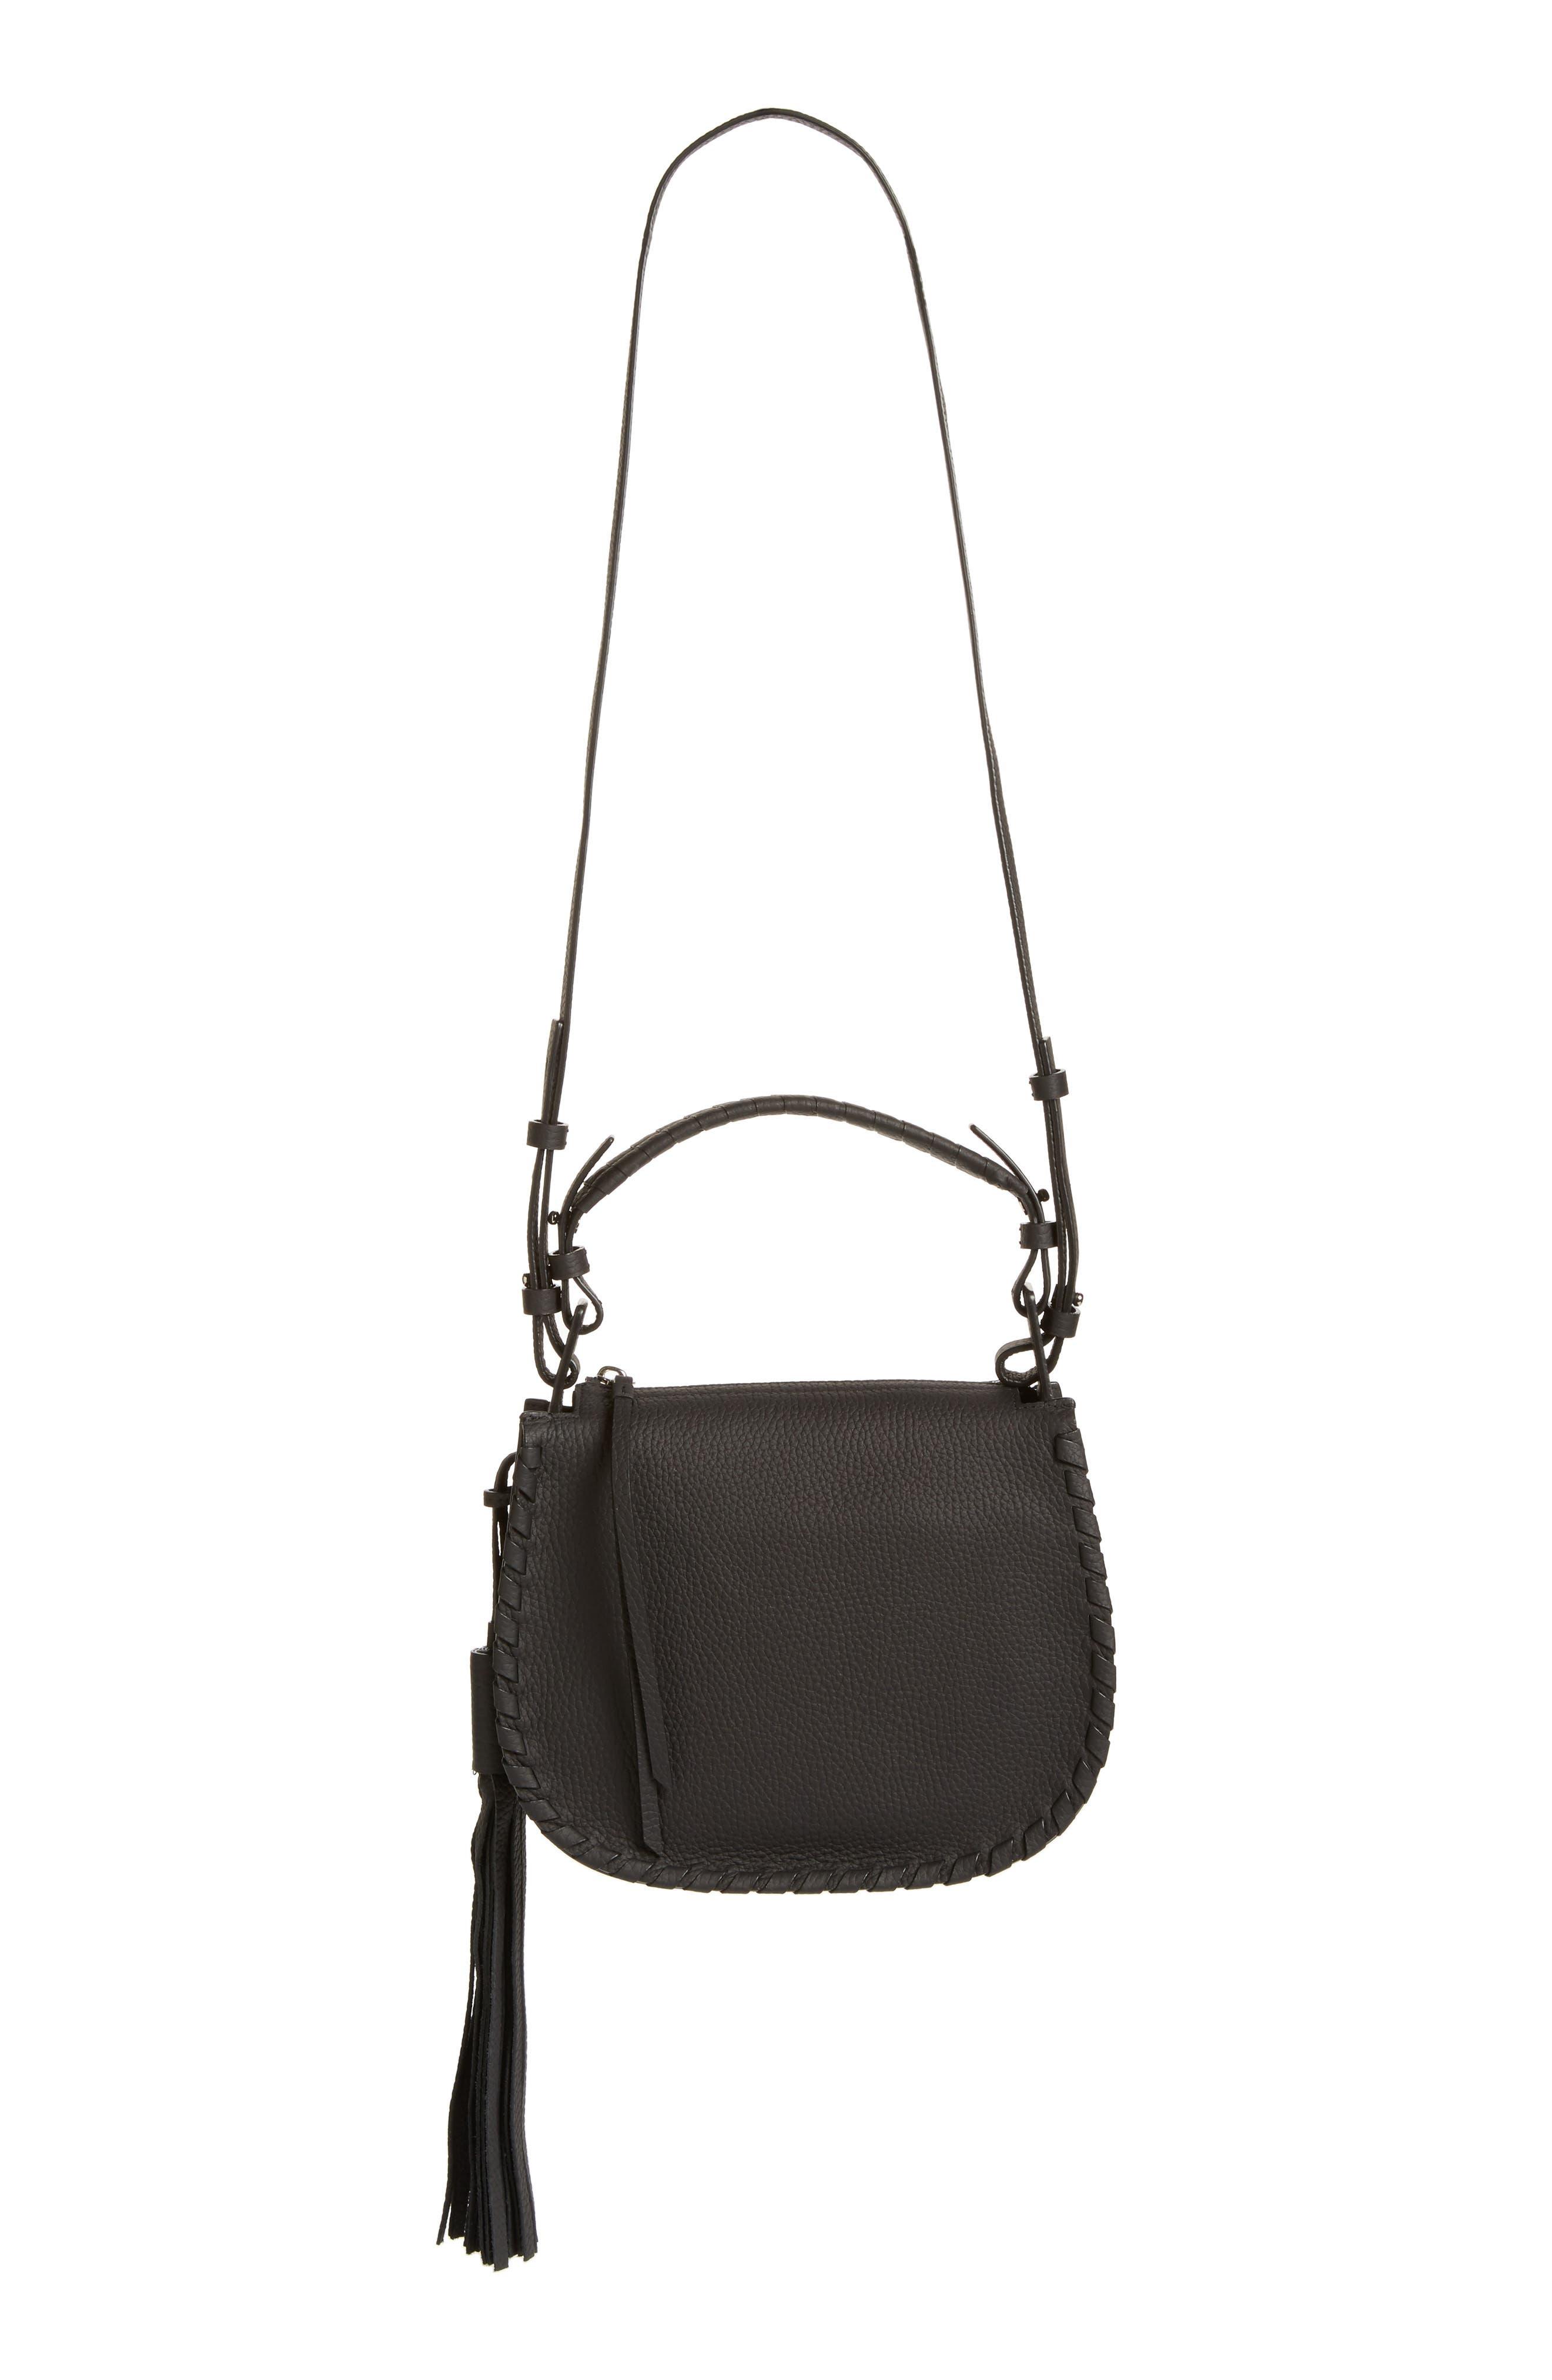 Mori Leather Crossbody Bag,                             Main thumbnail 1, color,                             BLACK